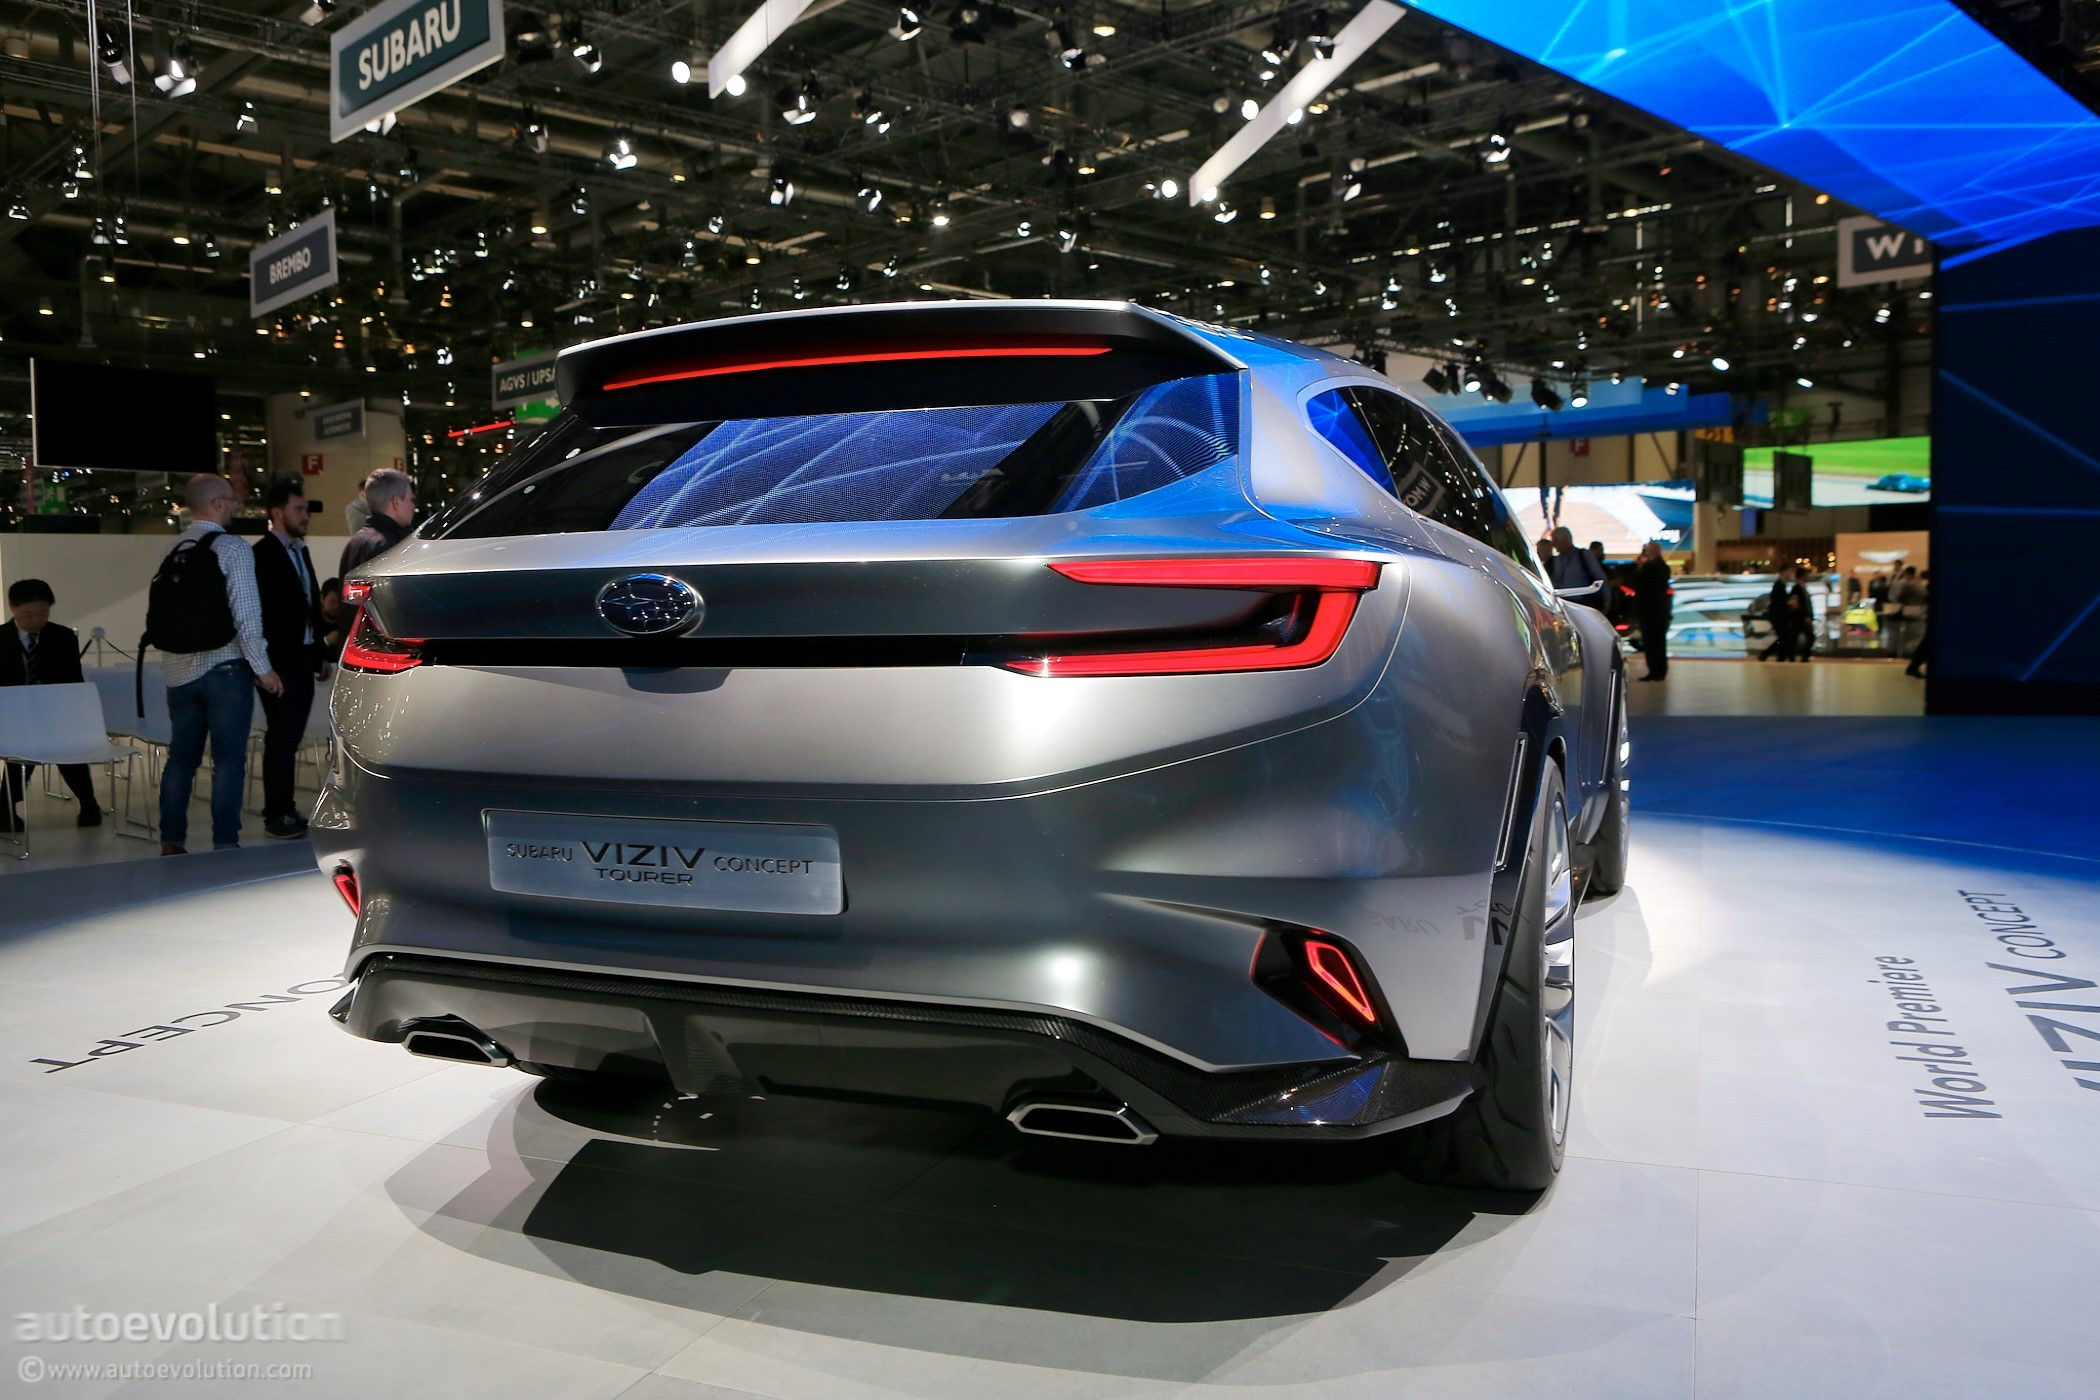 Subaru Gets Nostalgic In Geneva With Impreza Wrx Wagon Like Viziv